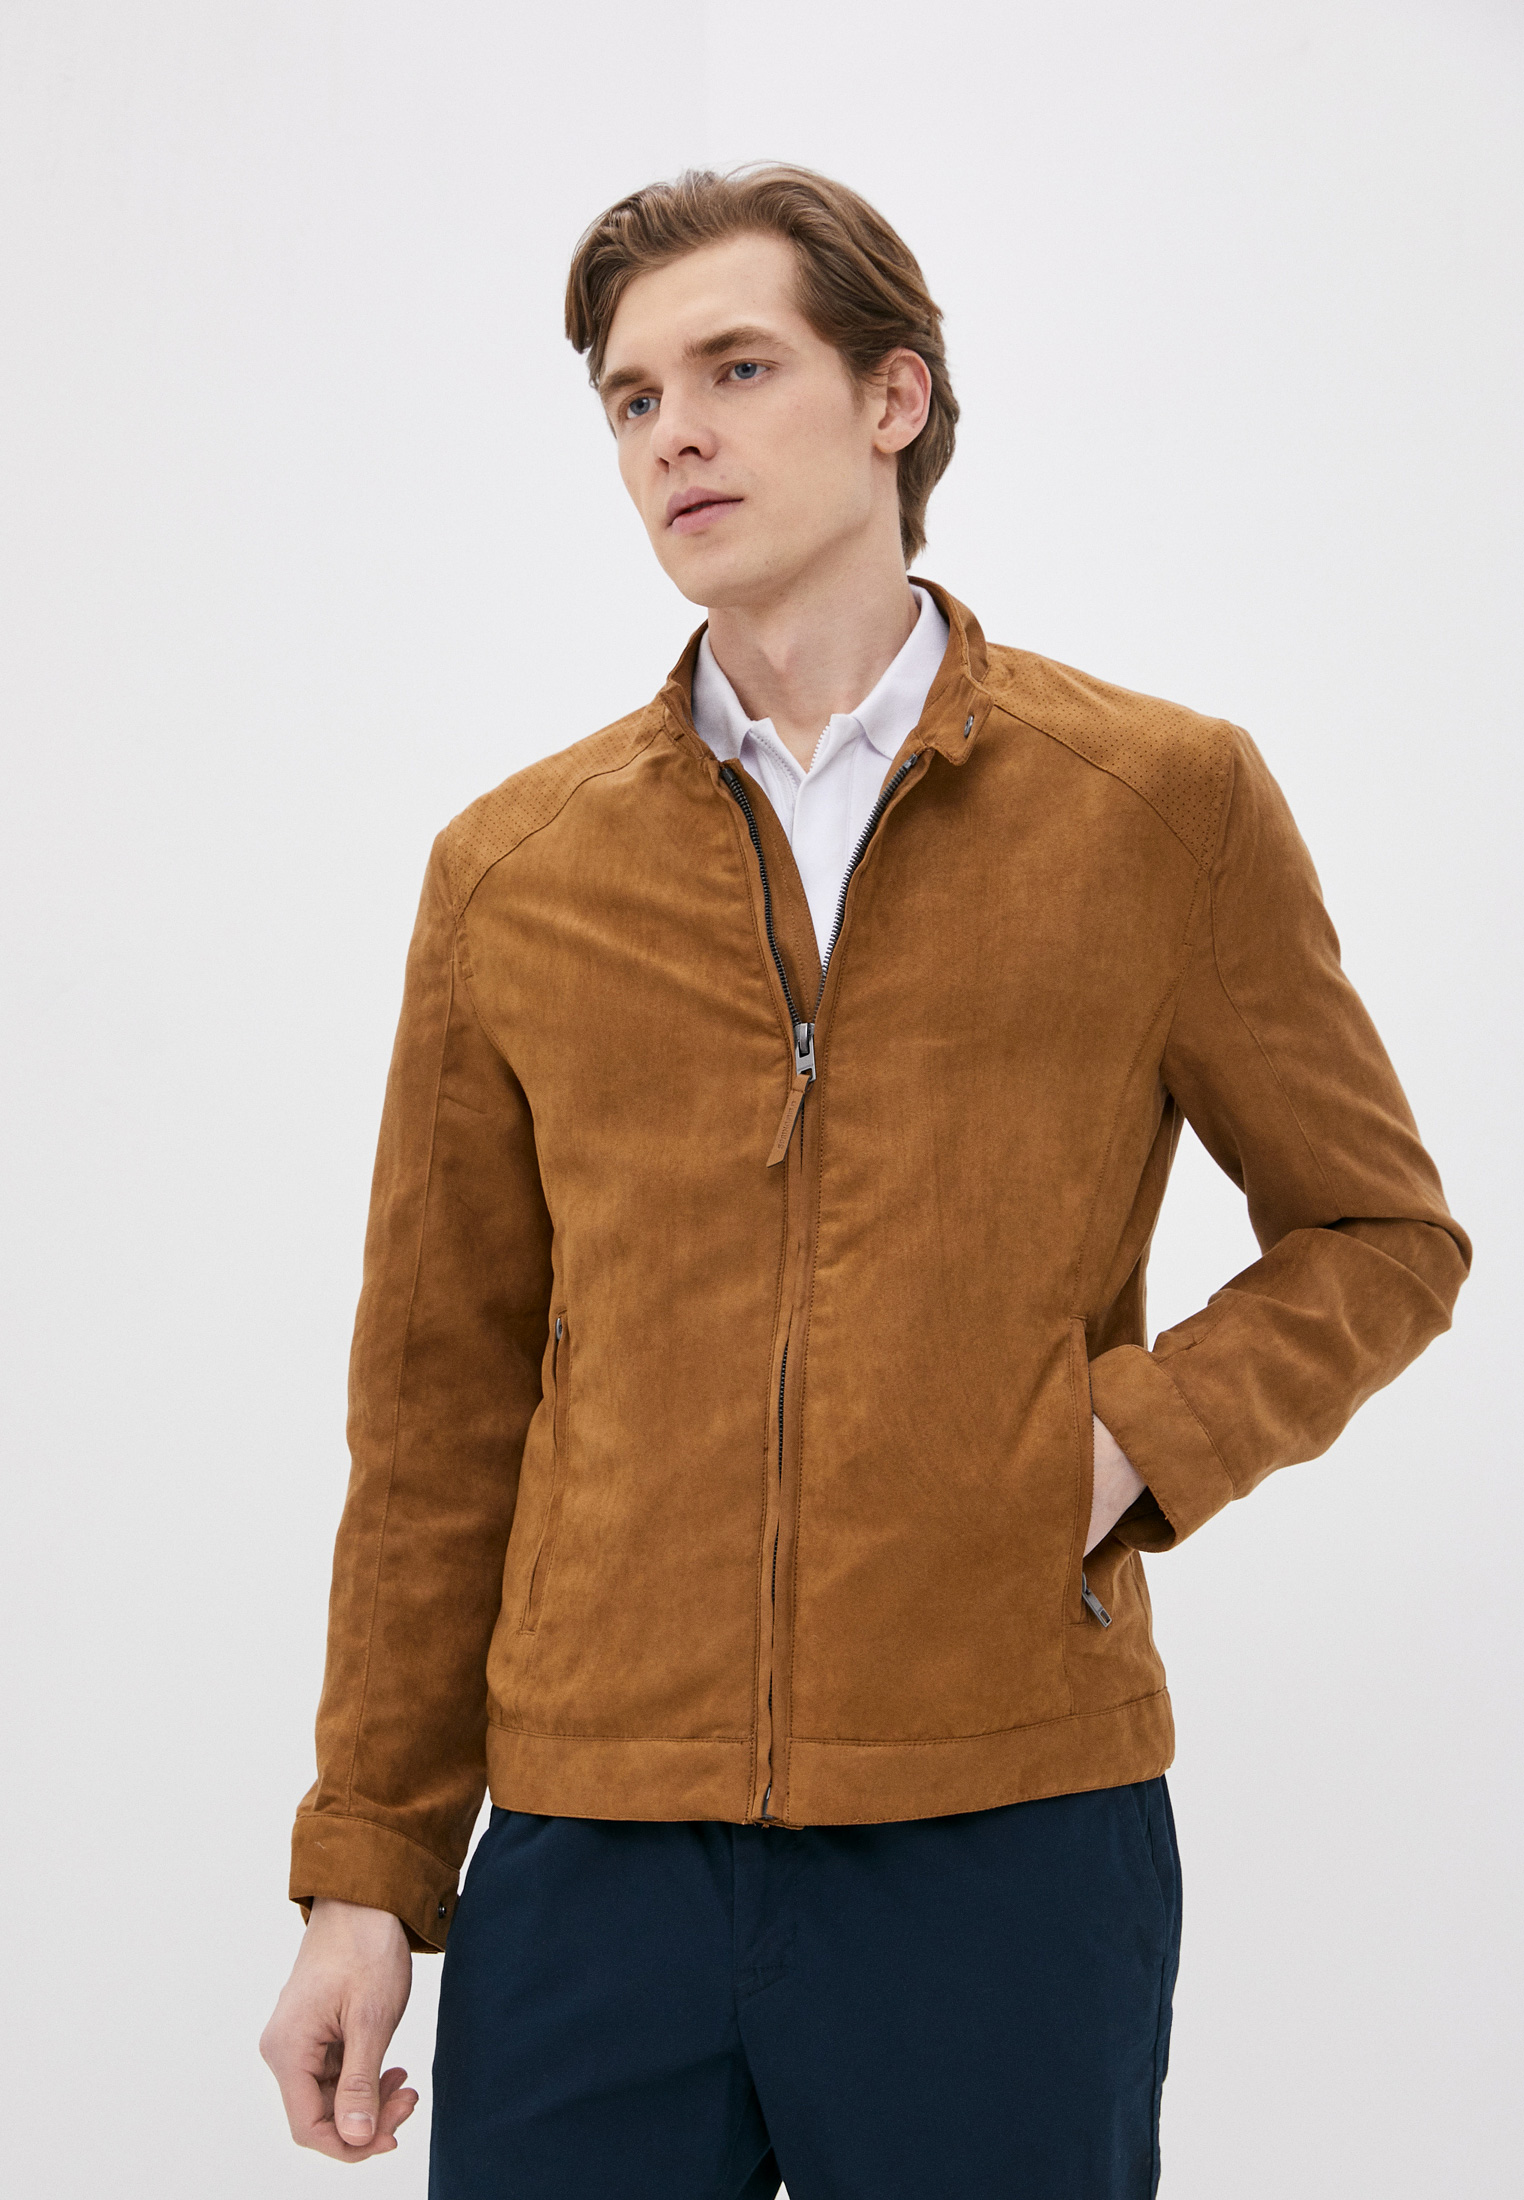 Кожаная куртка SPRINGFIELD Куртка кожаная Springfield